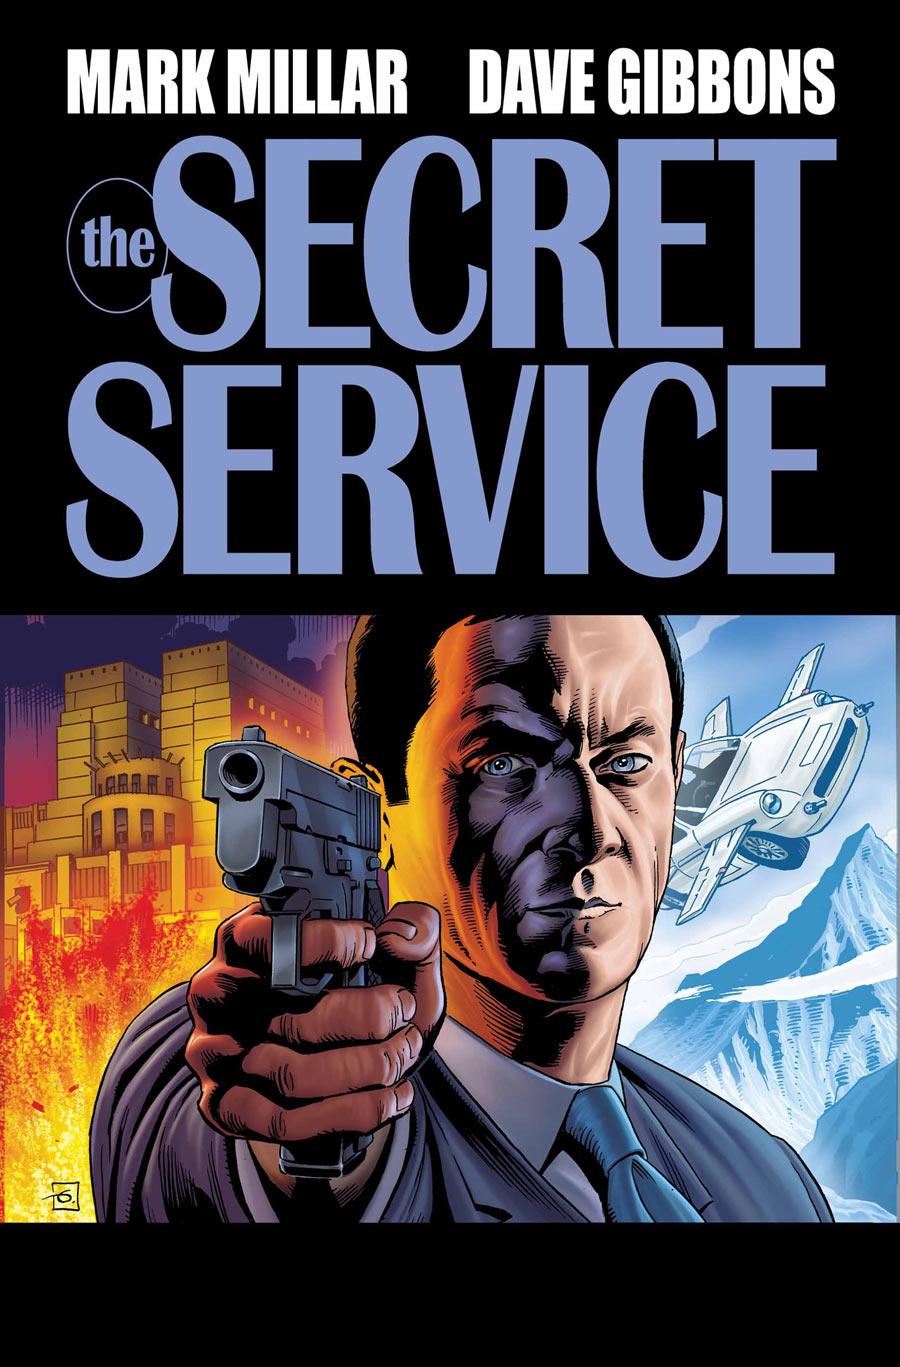 The Secret Service Vol.1 #5